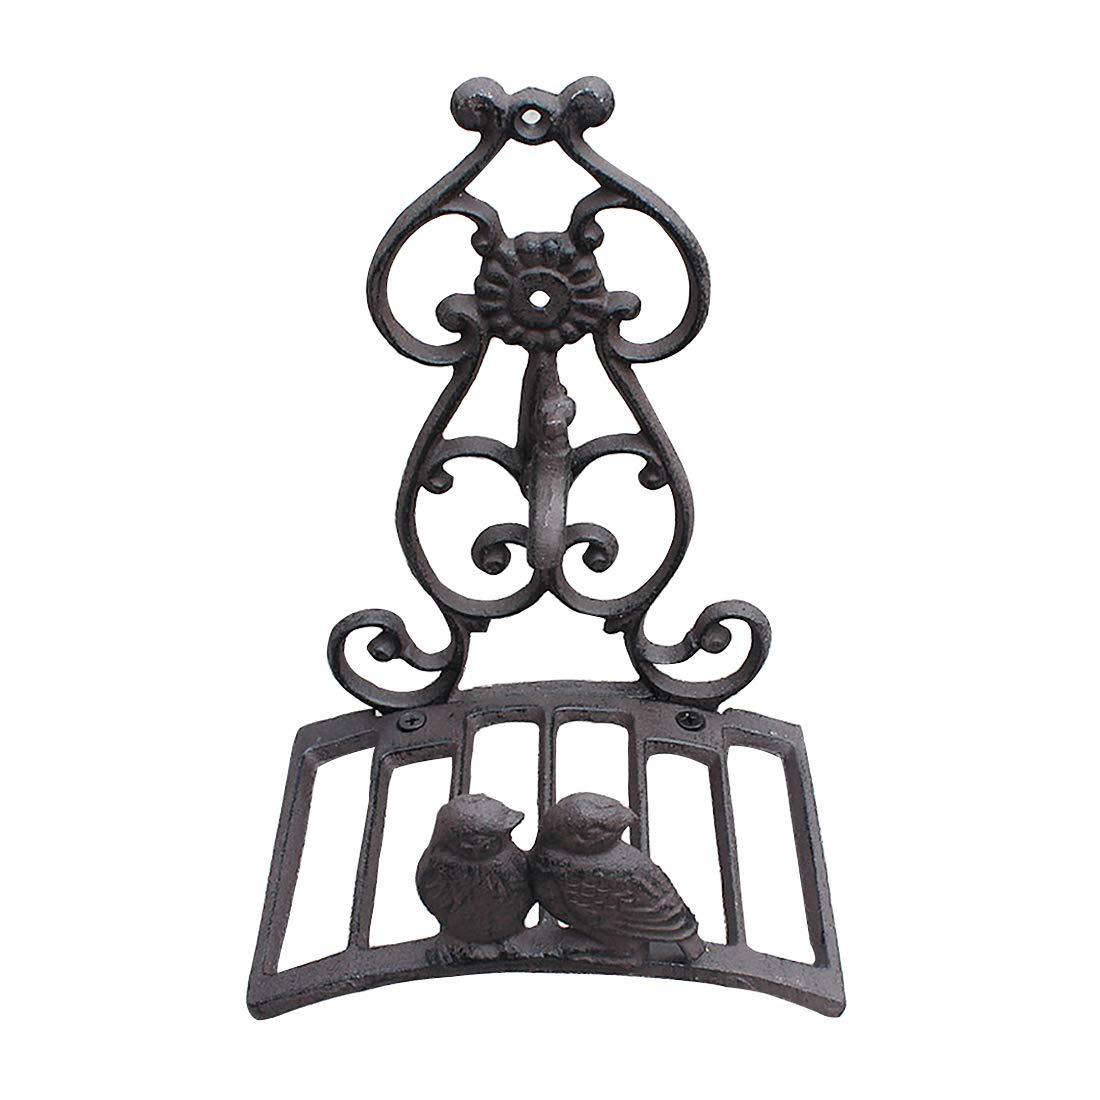 Sungmor Heavy Duty Cast Iron Garden Hose Holder,Wall Mounted Hose Rack,Decorative Hose Hanger,Antique Garden & Yard Decorations